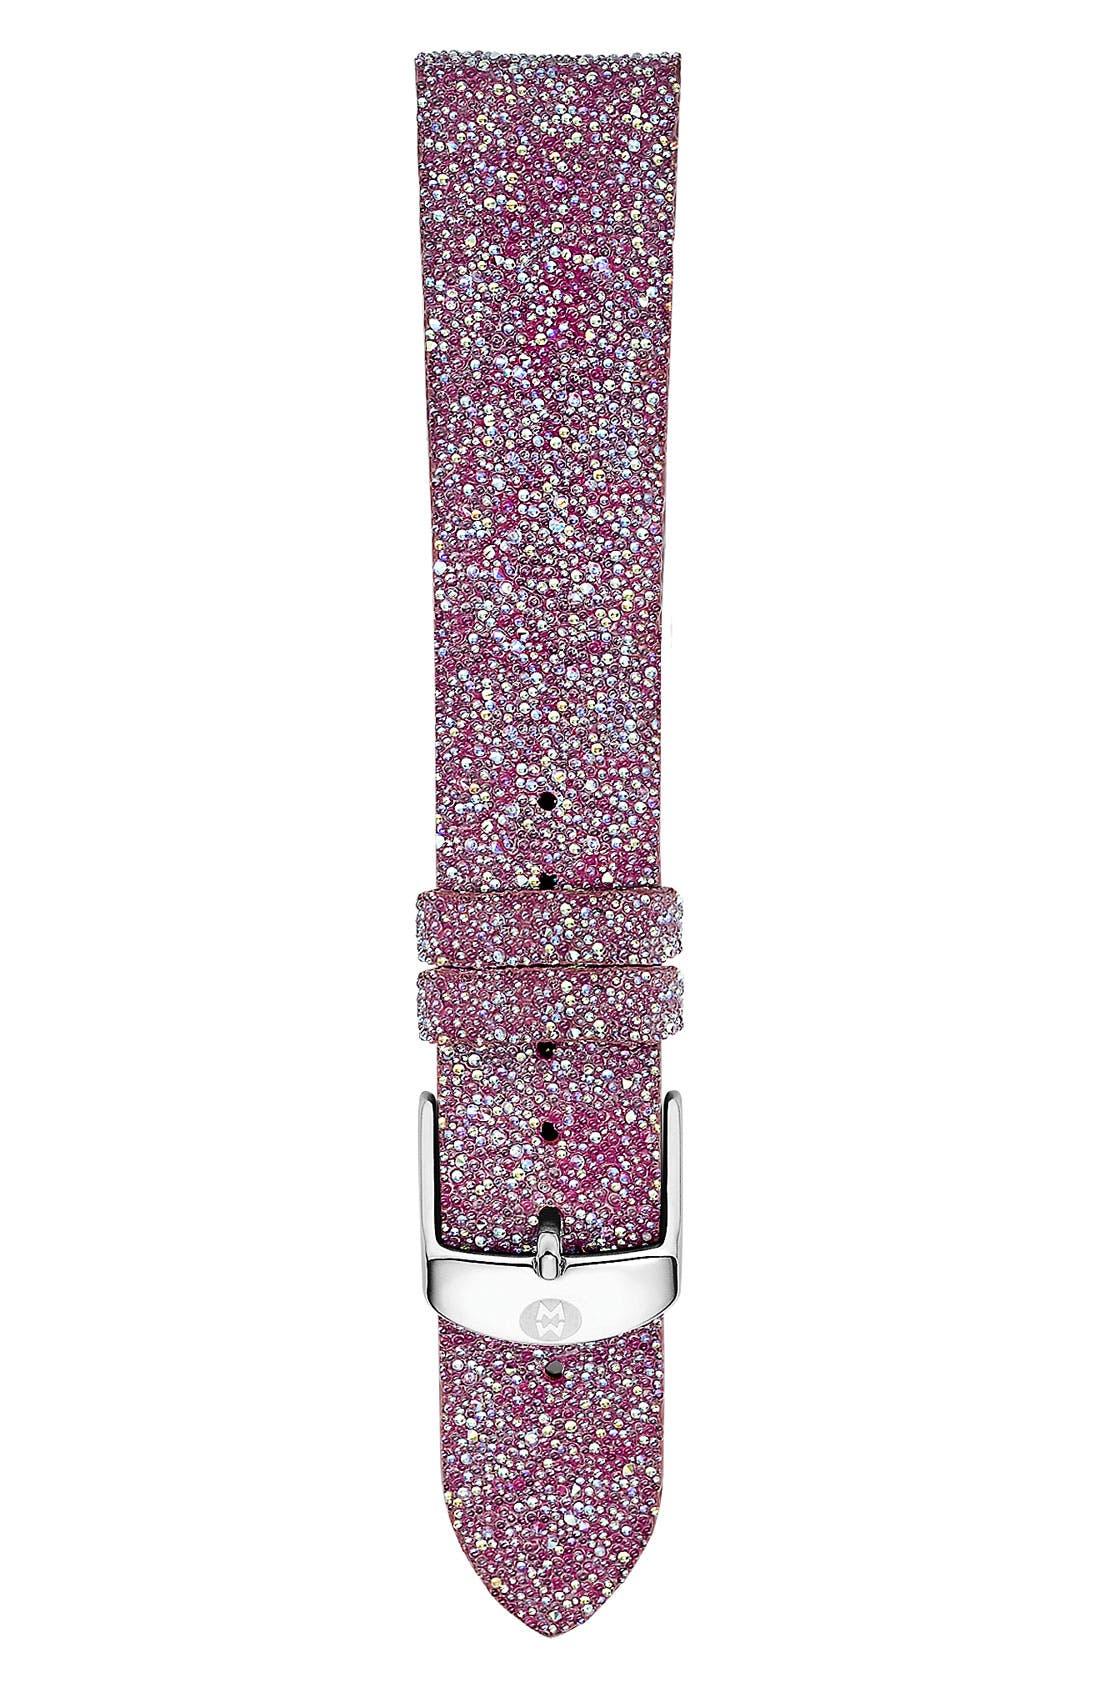 Alternate Image 1 Selected - MICHELE 16mm Glitter Watch Strap